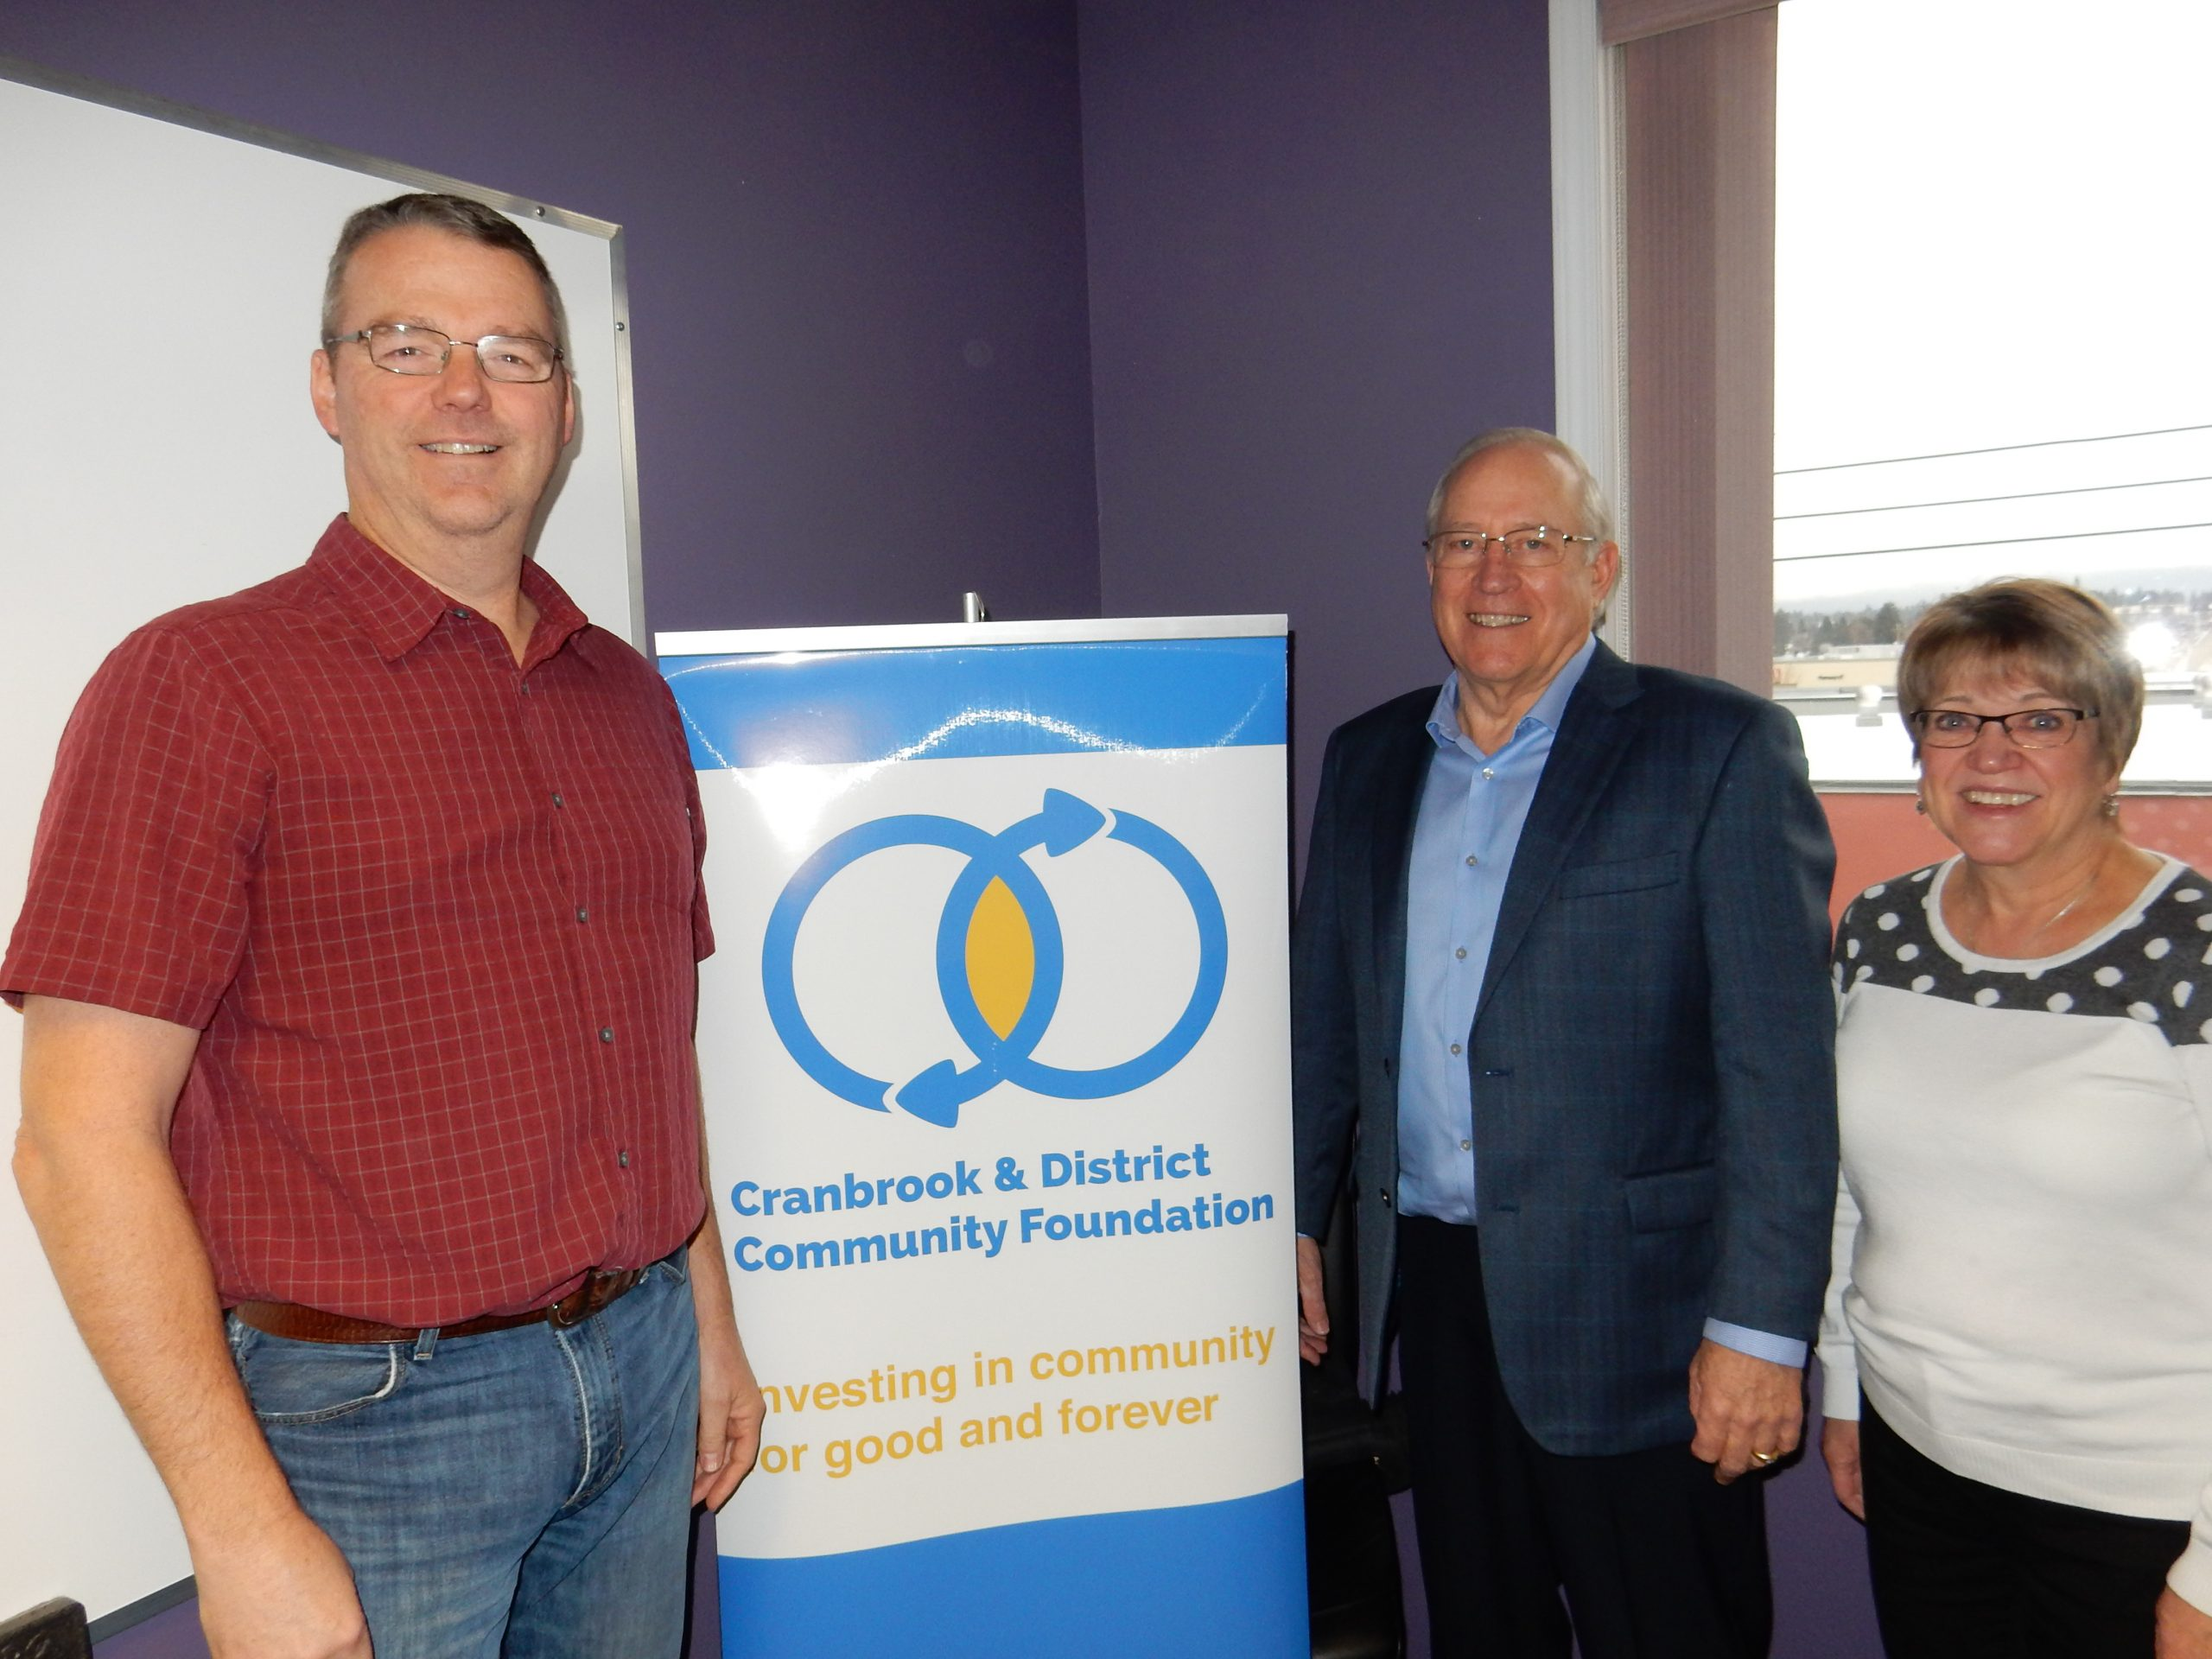 Fernie Community Fund receives $50K grant from CBT